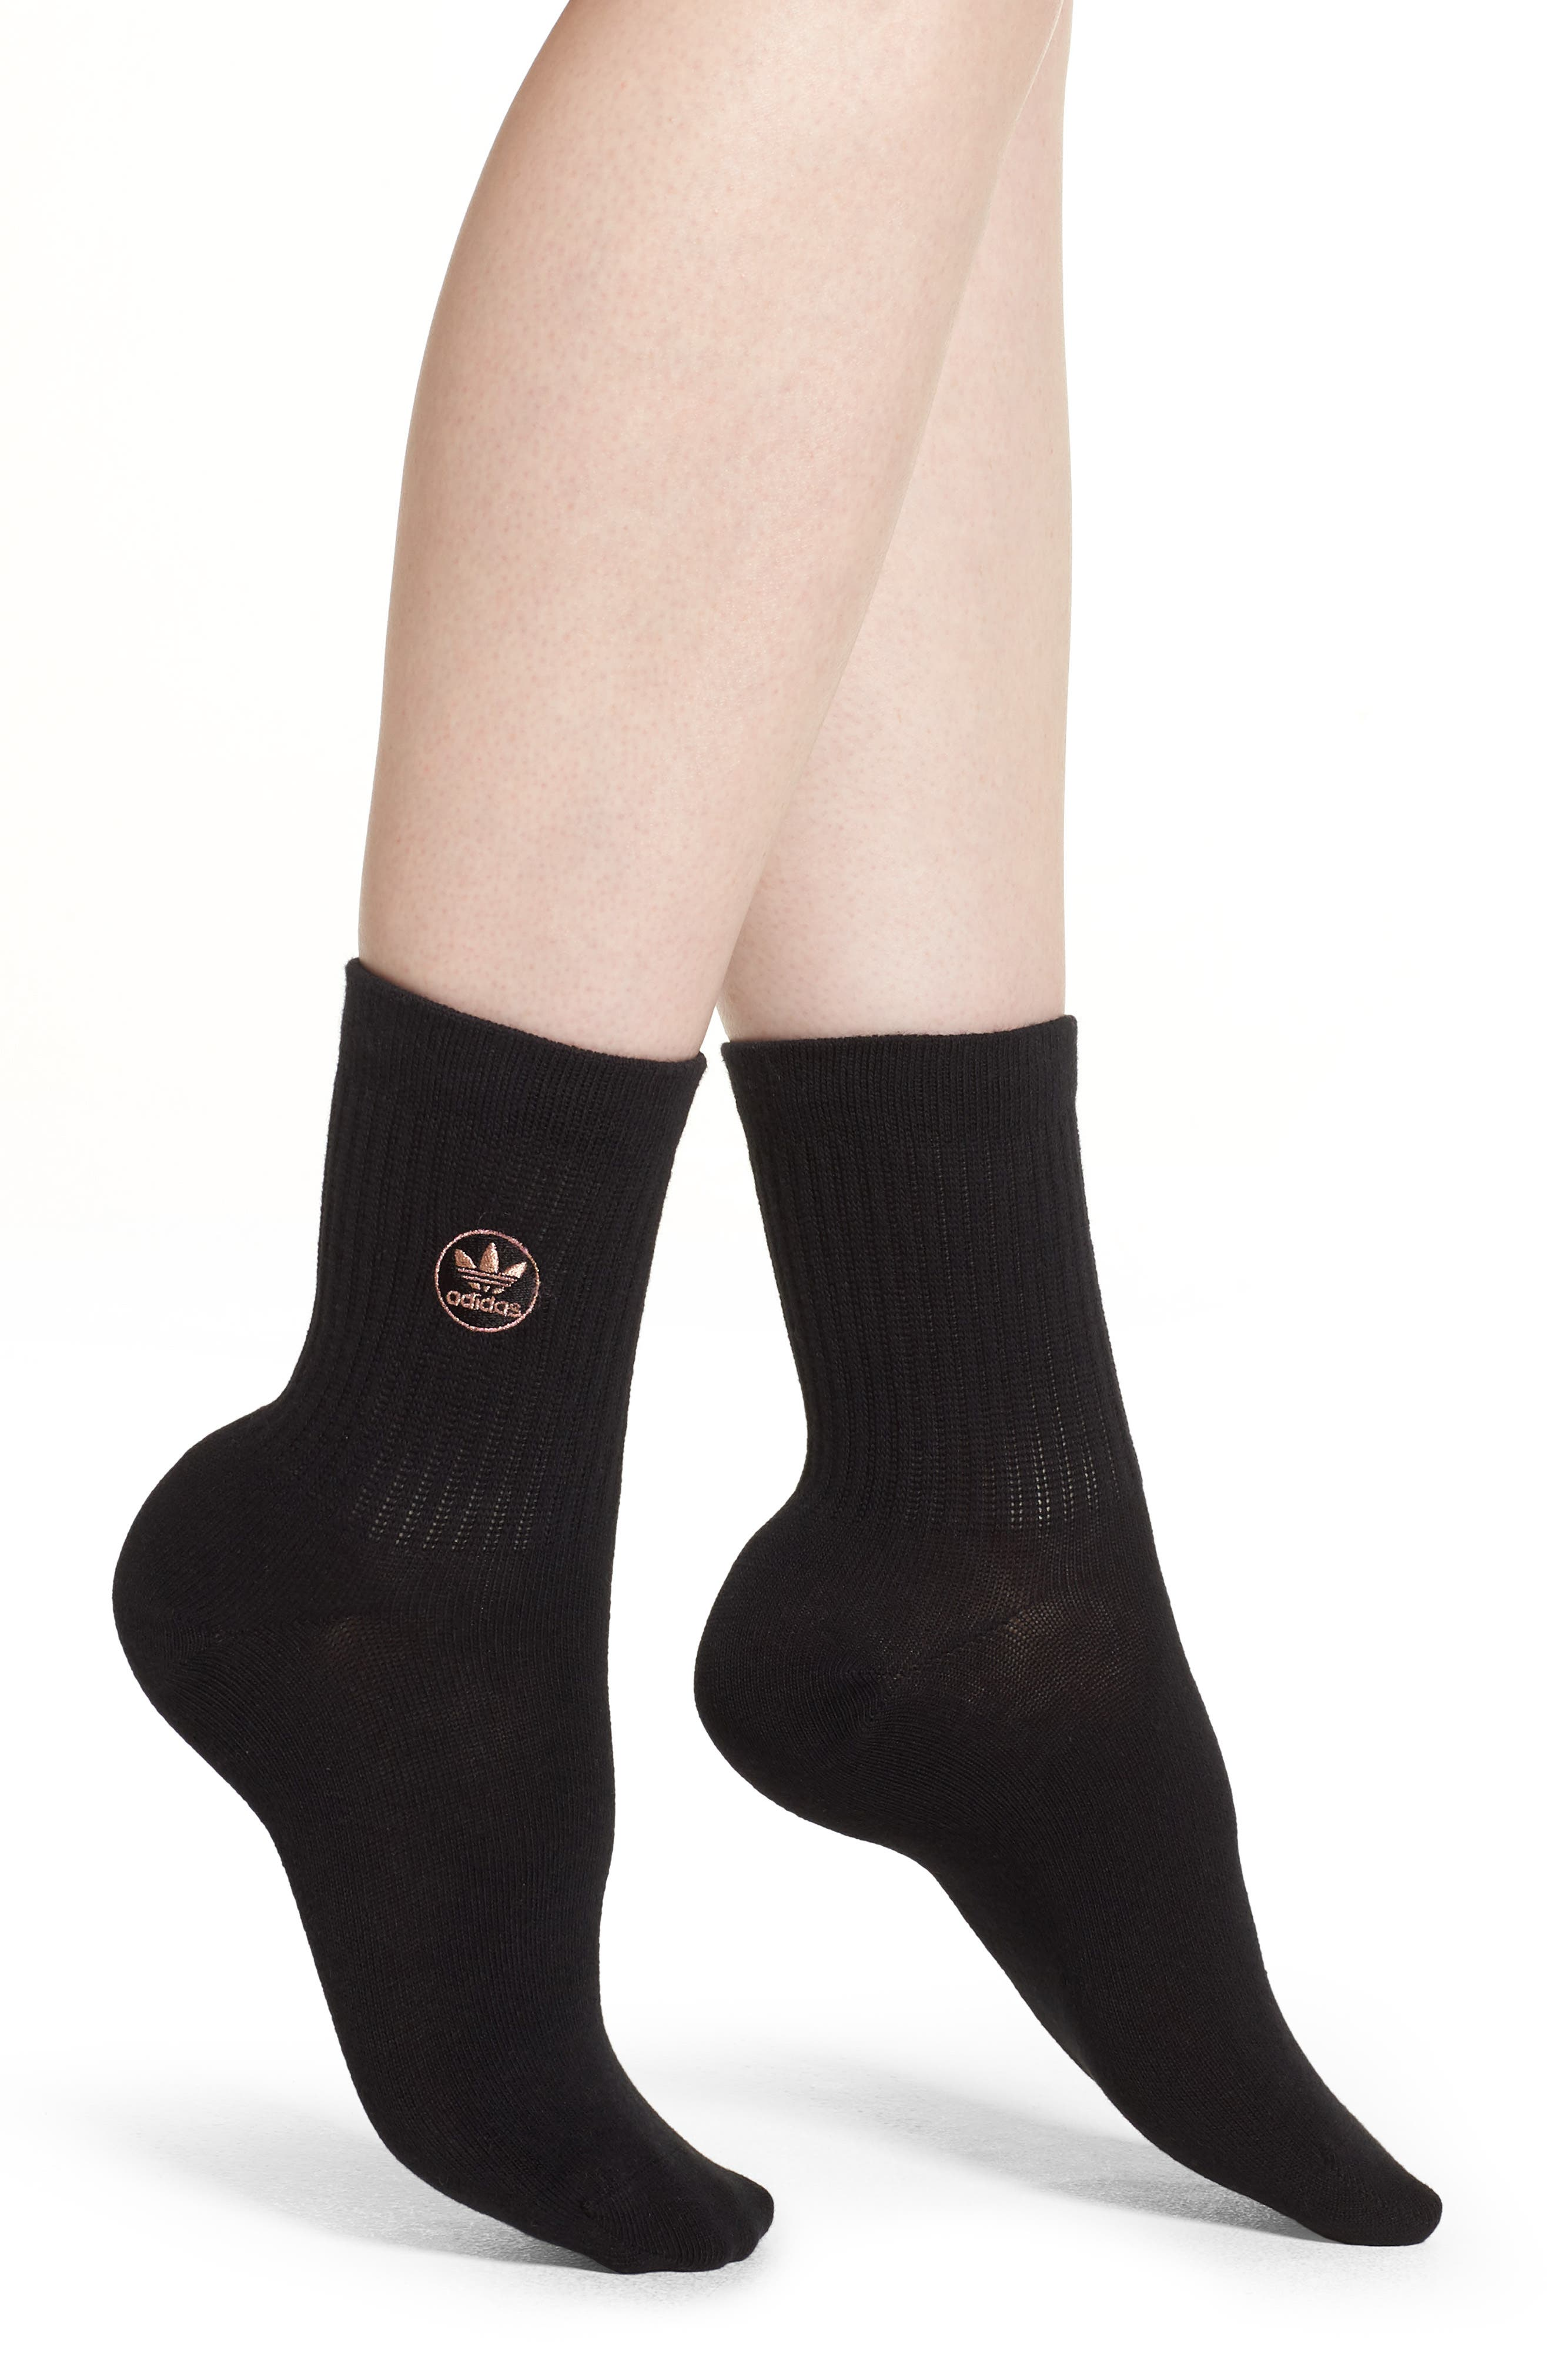 Quarter Crew Socks,                         Main,                         color, 001